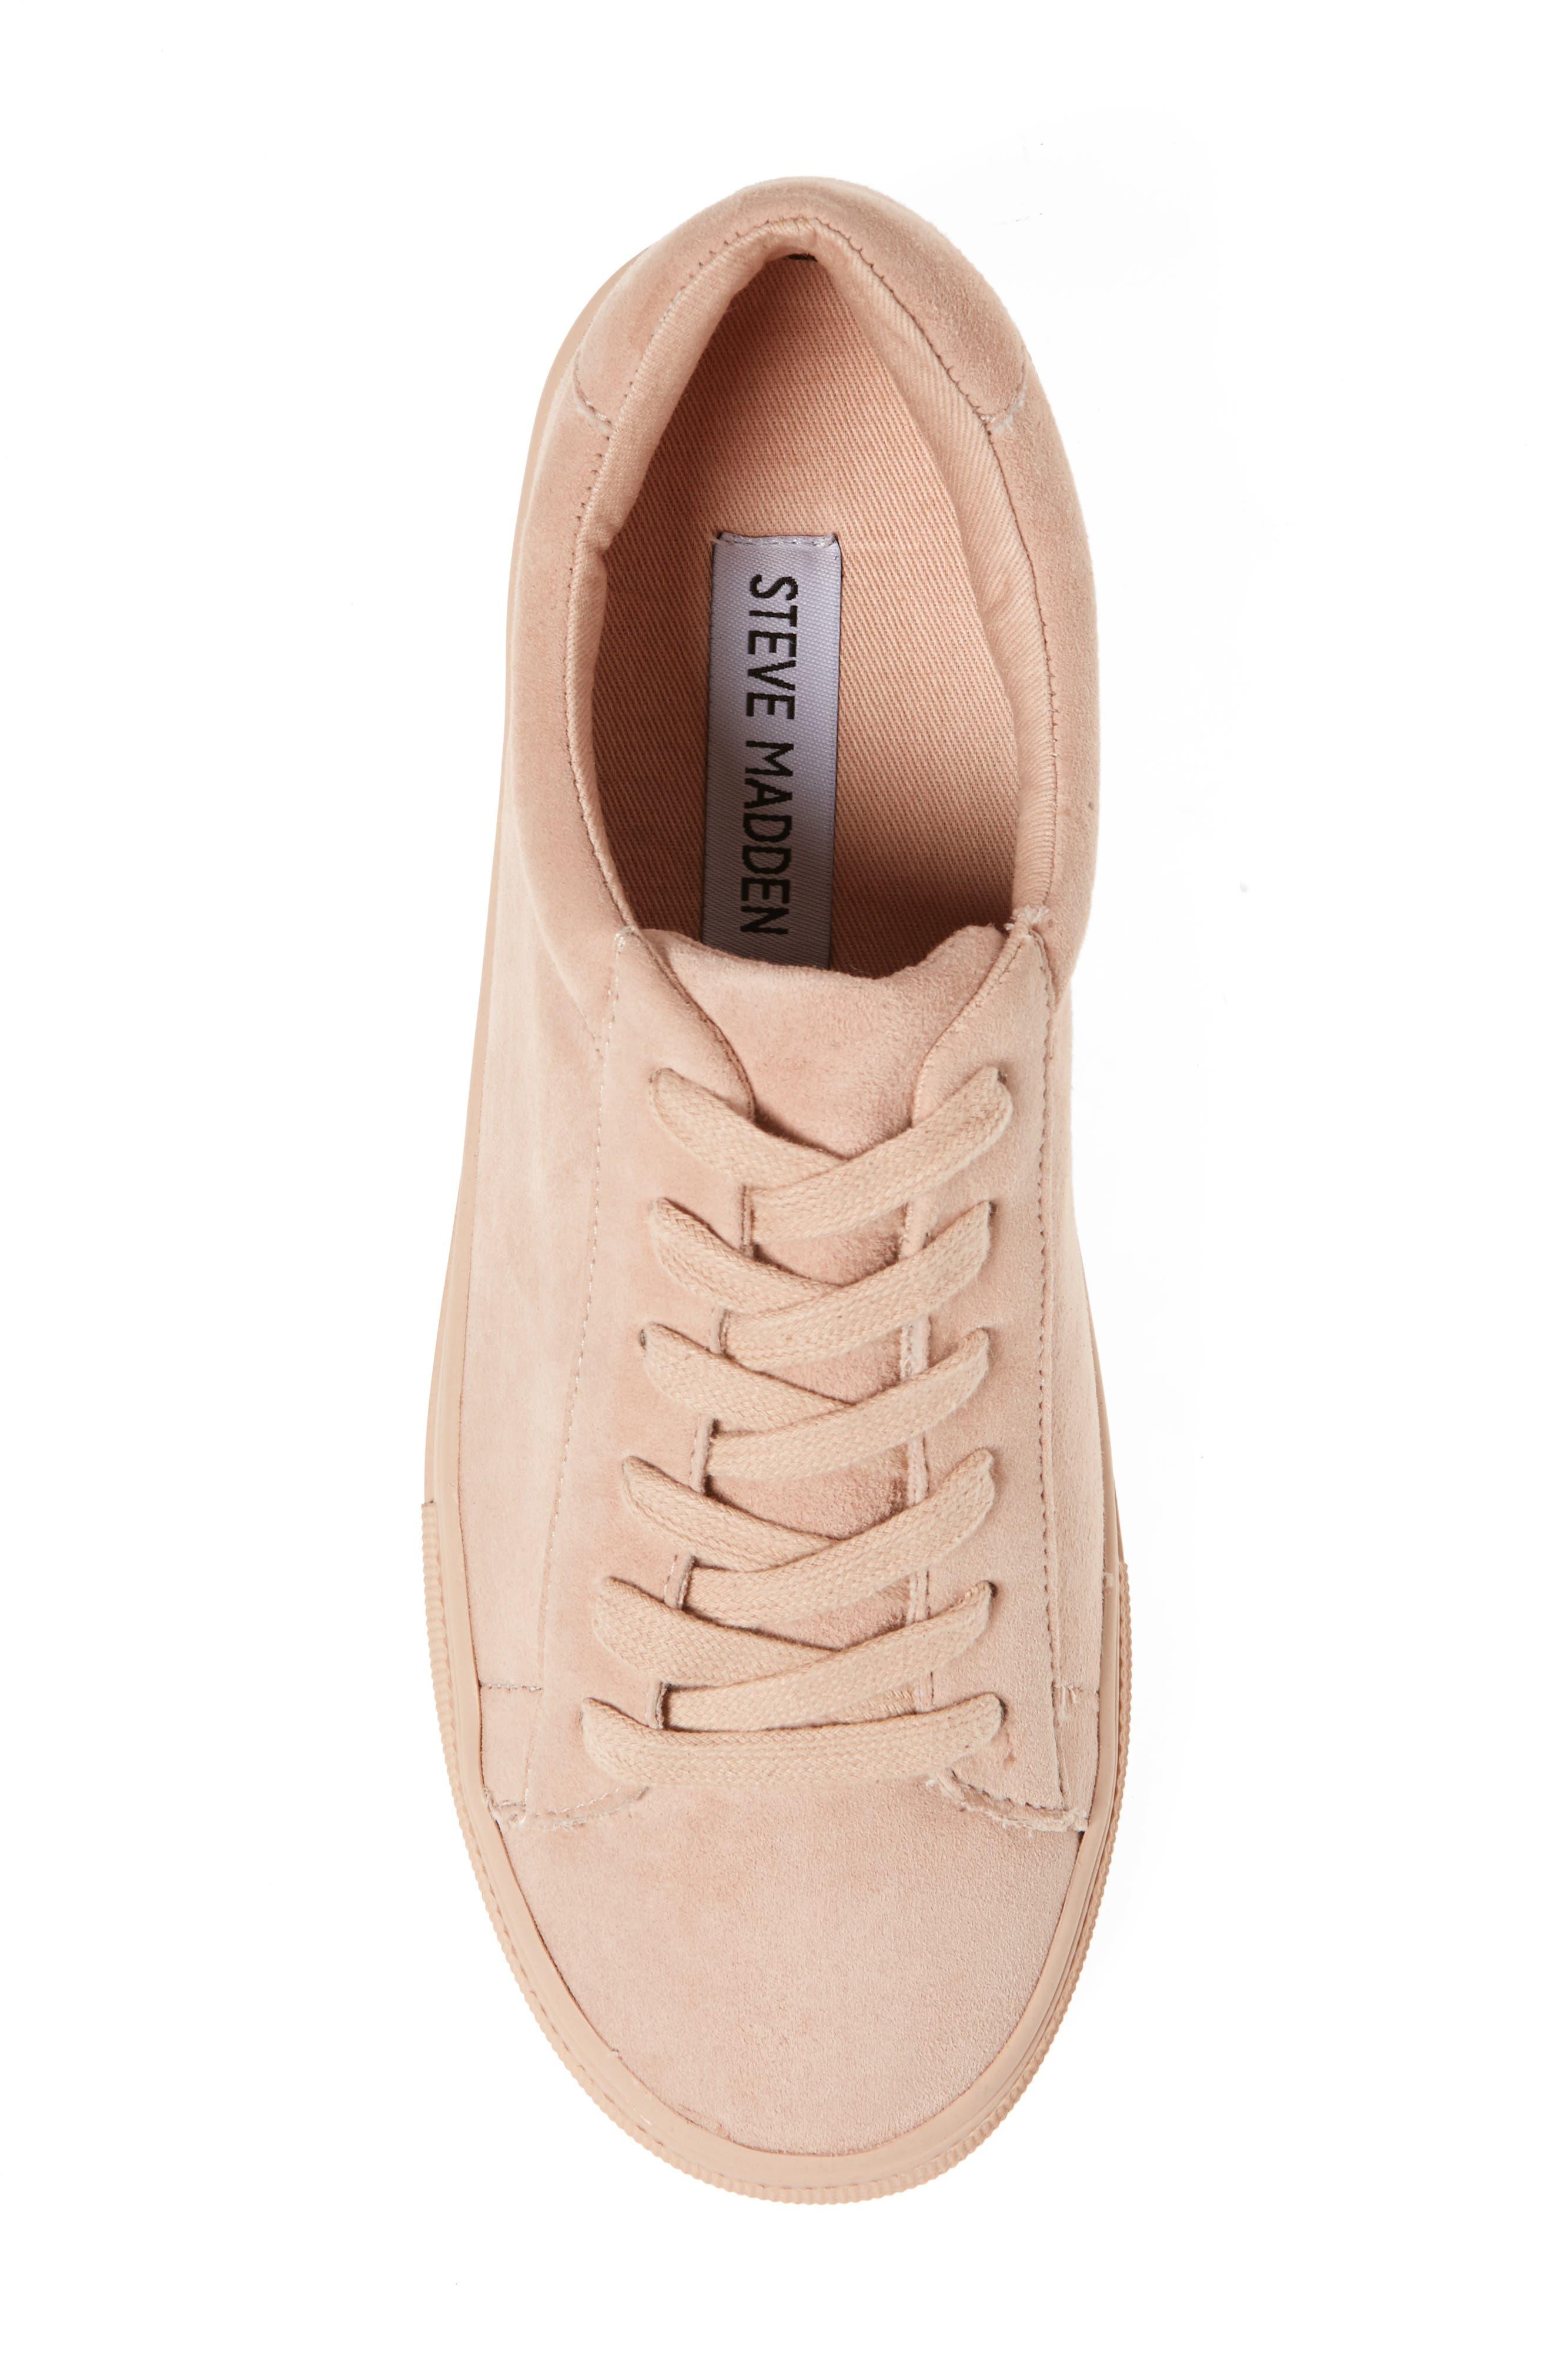 Gisela Low Top Sneaker,                             Alternate thumbnail 15, color,